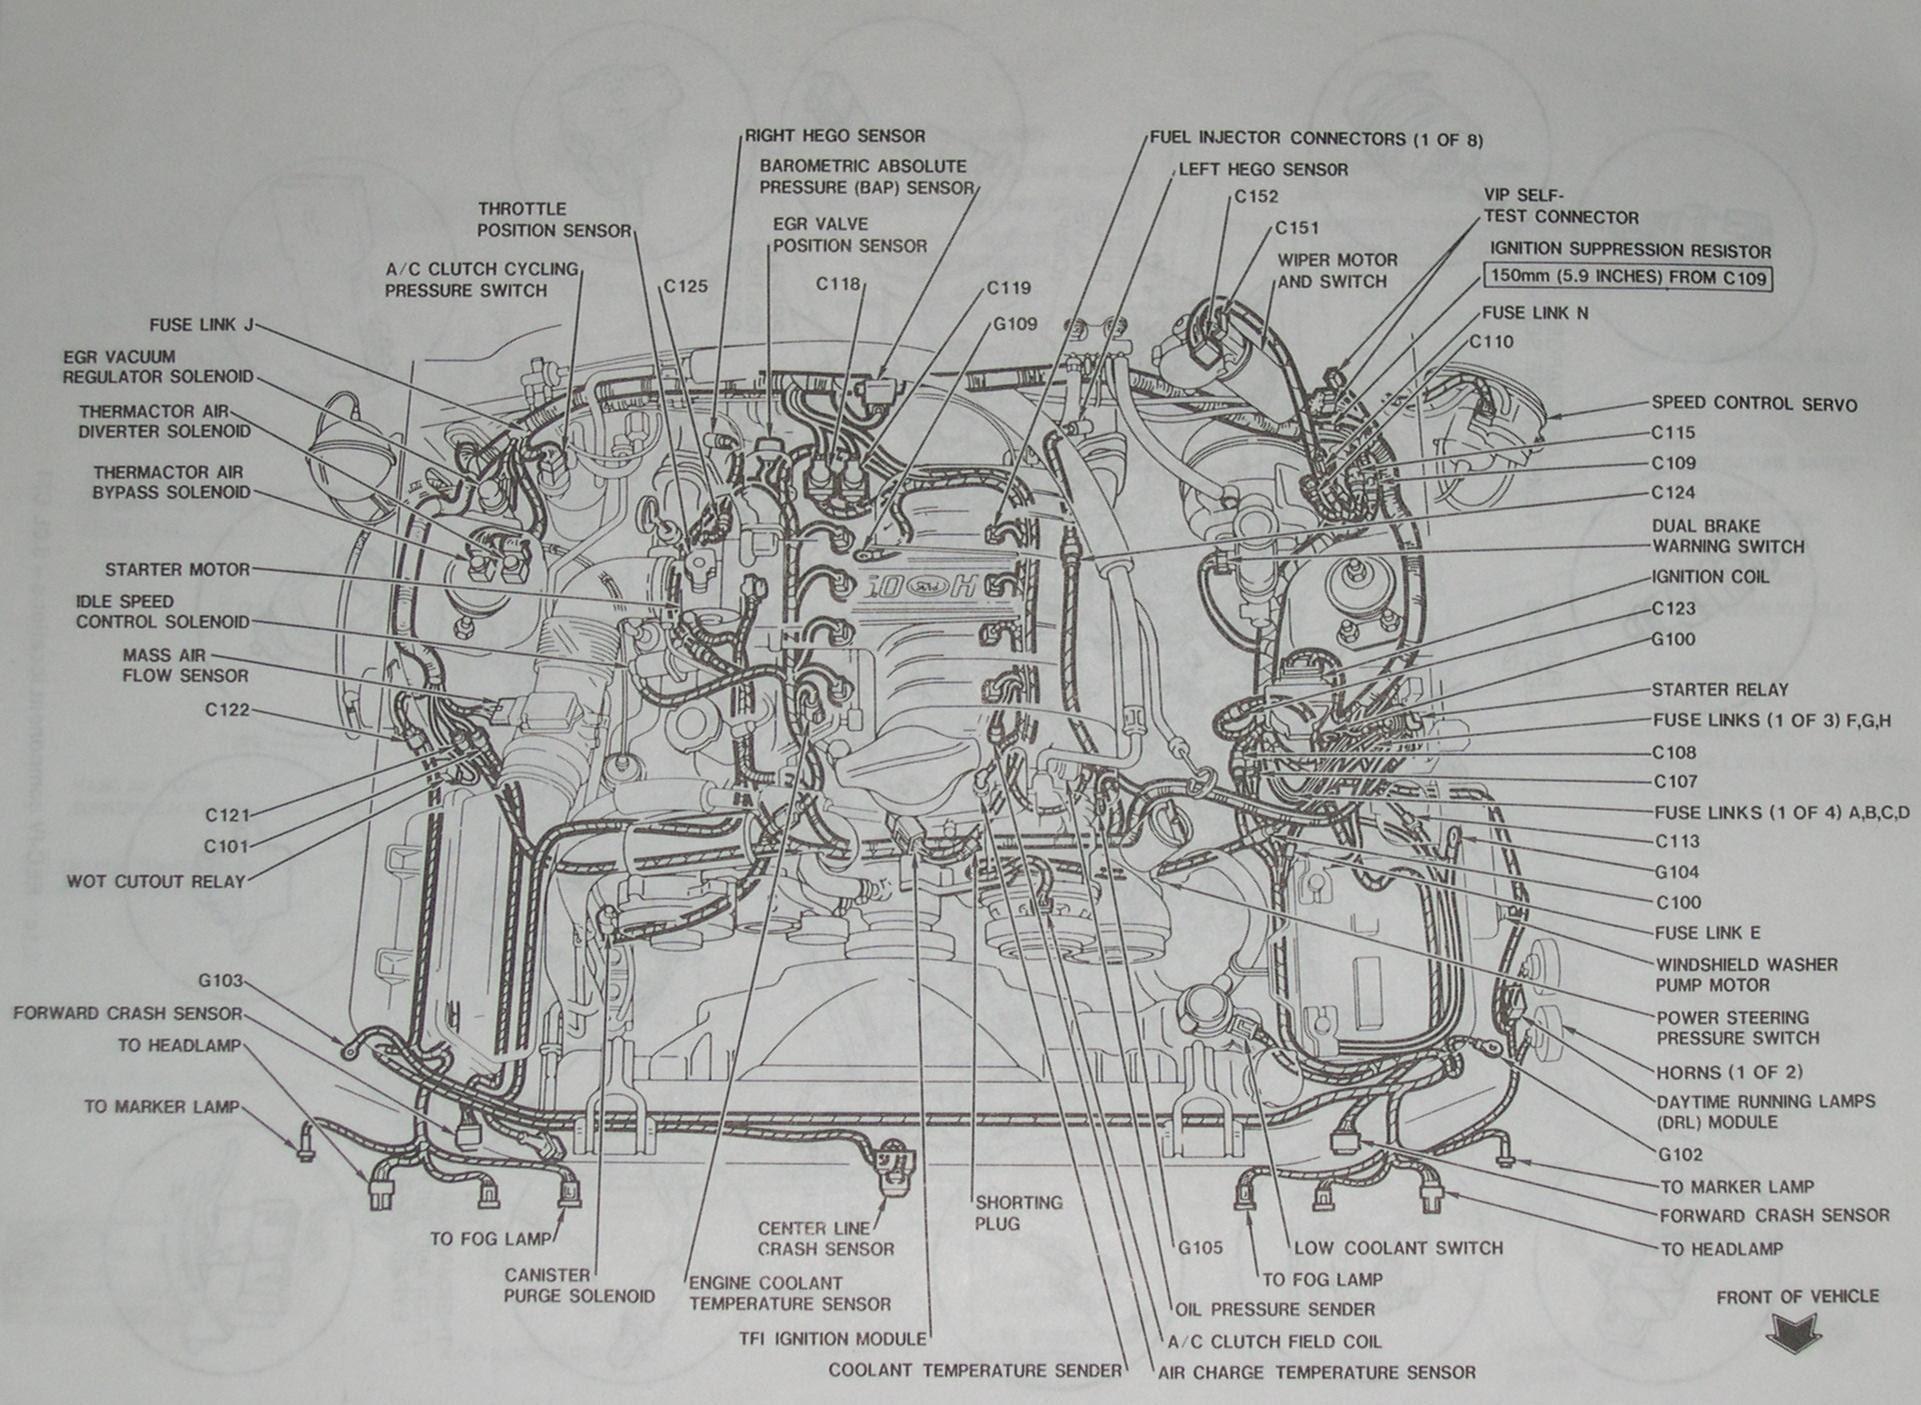 2000 Ford V6 Engine Diagram Wiring Diagrams Name Name Miglioribanche It